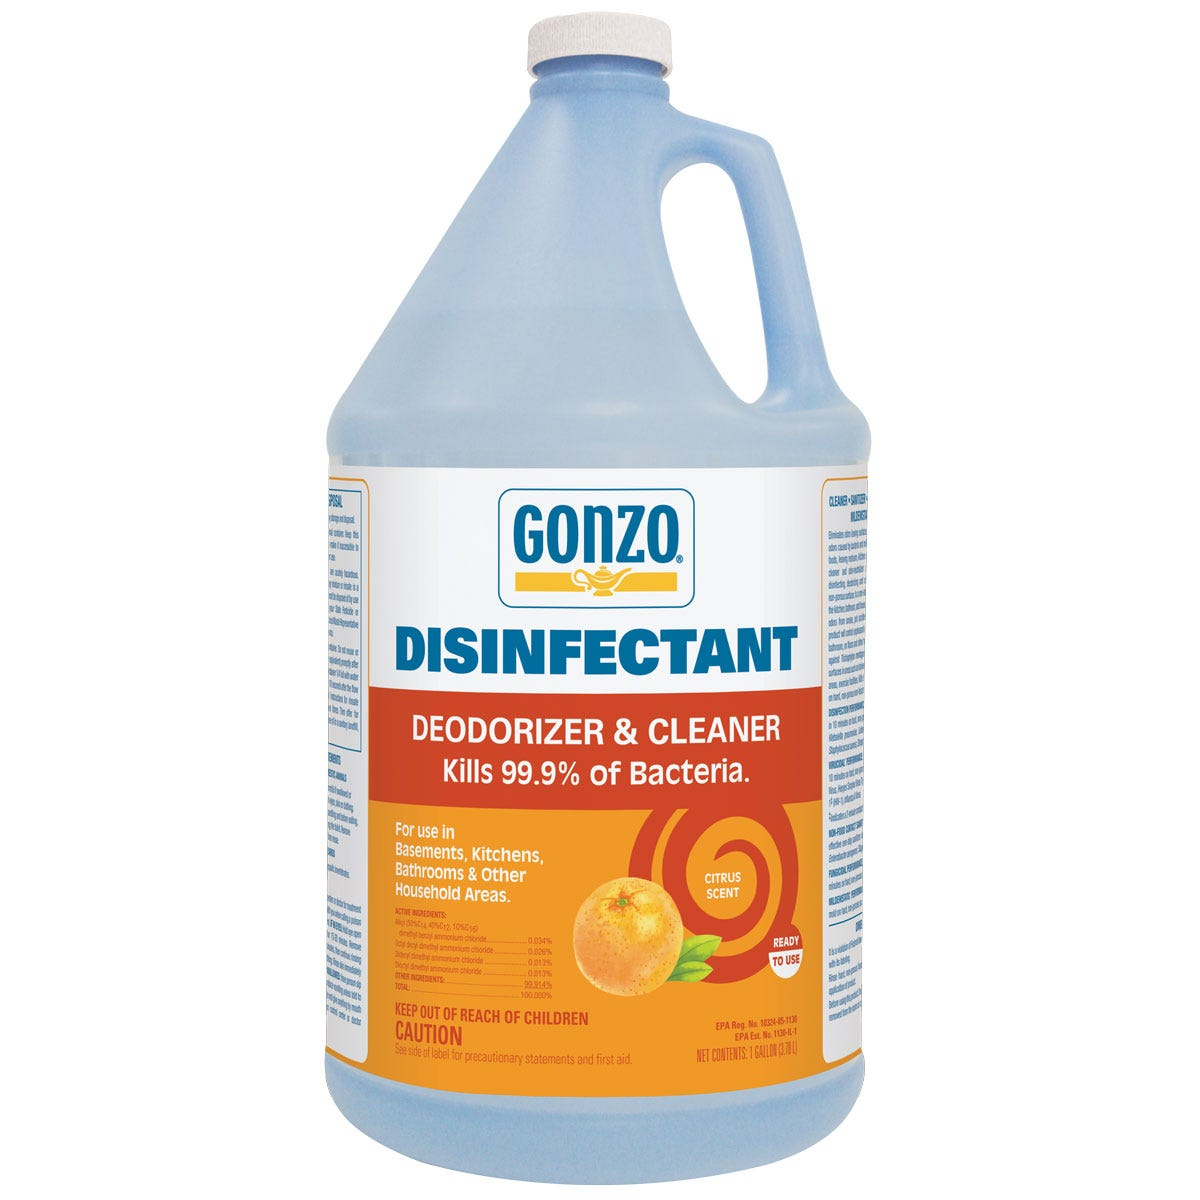 https://googone.com/media/catalog/product/c/i/citrus-disinfectant-odor-eliminator_front.jpg